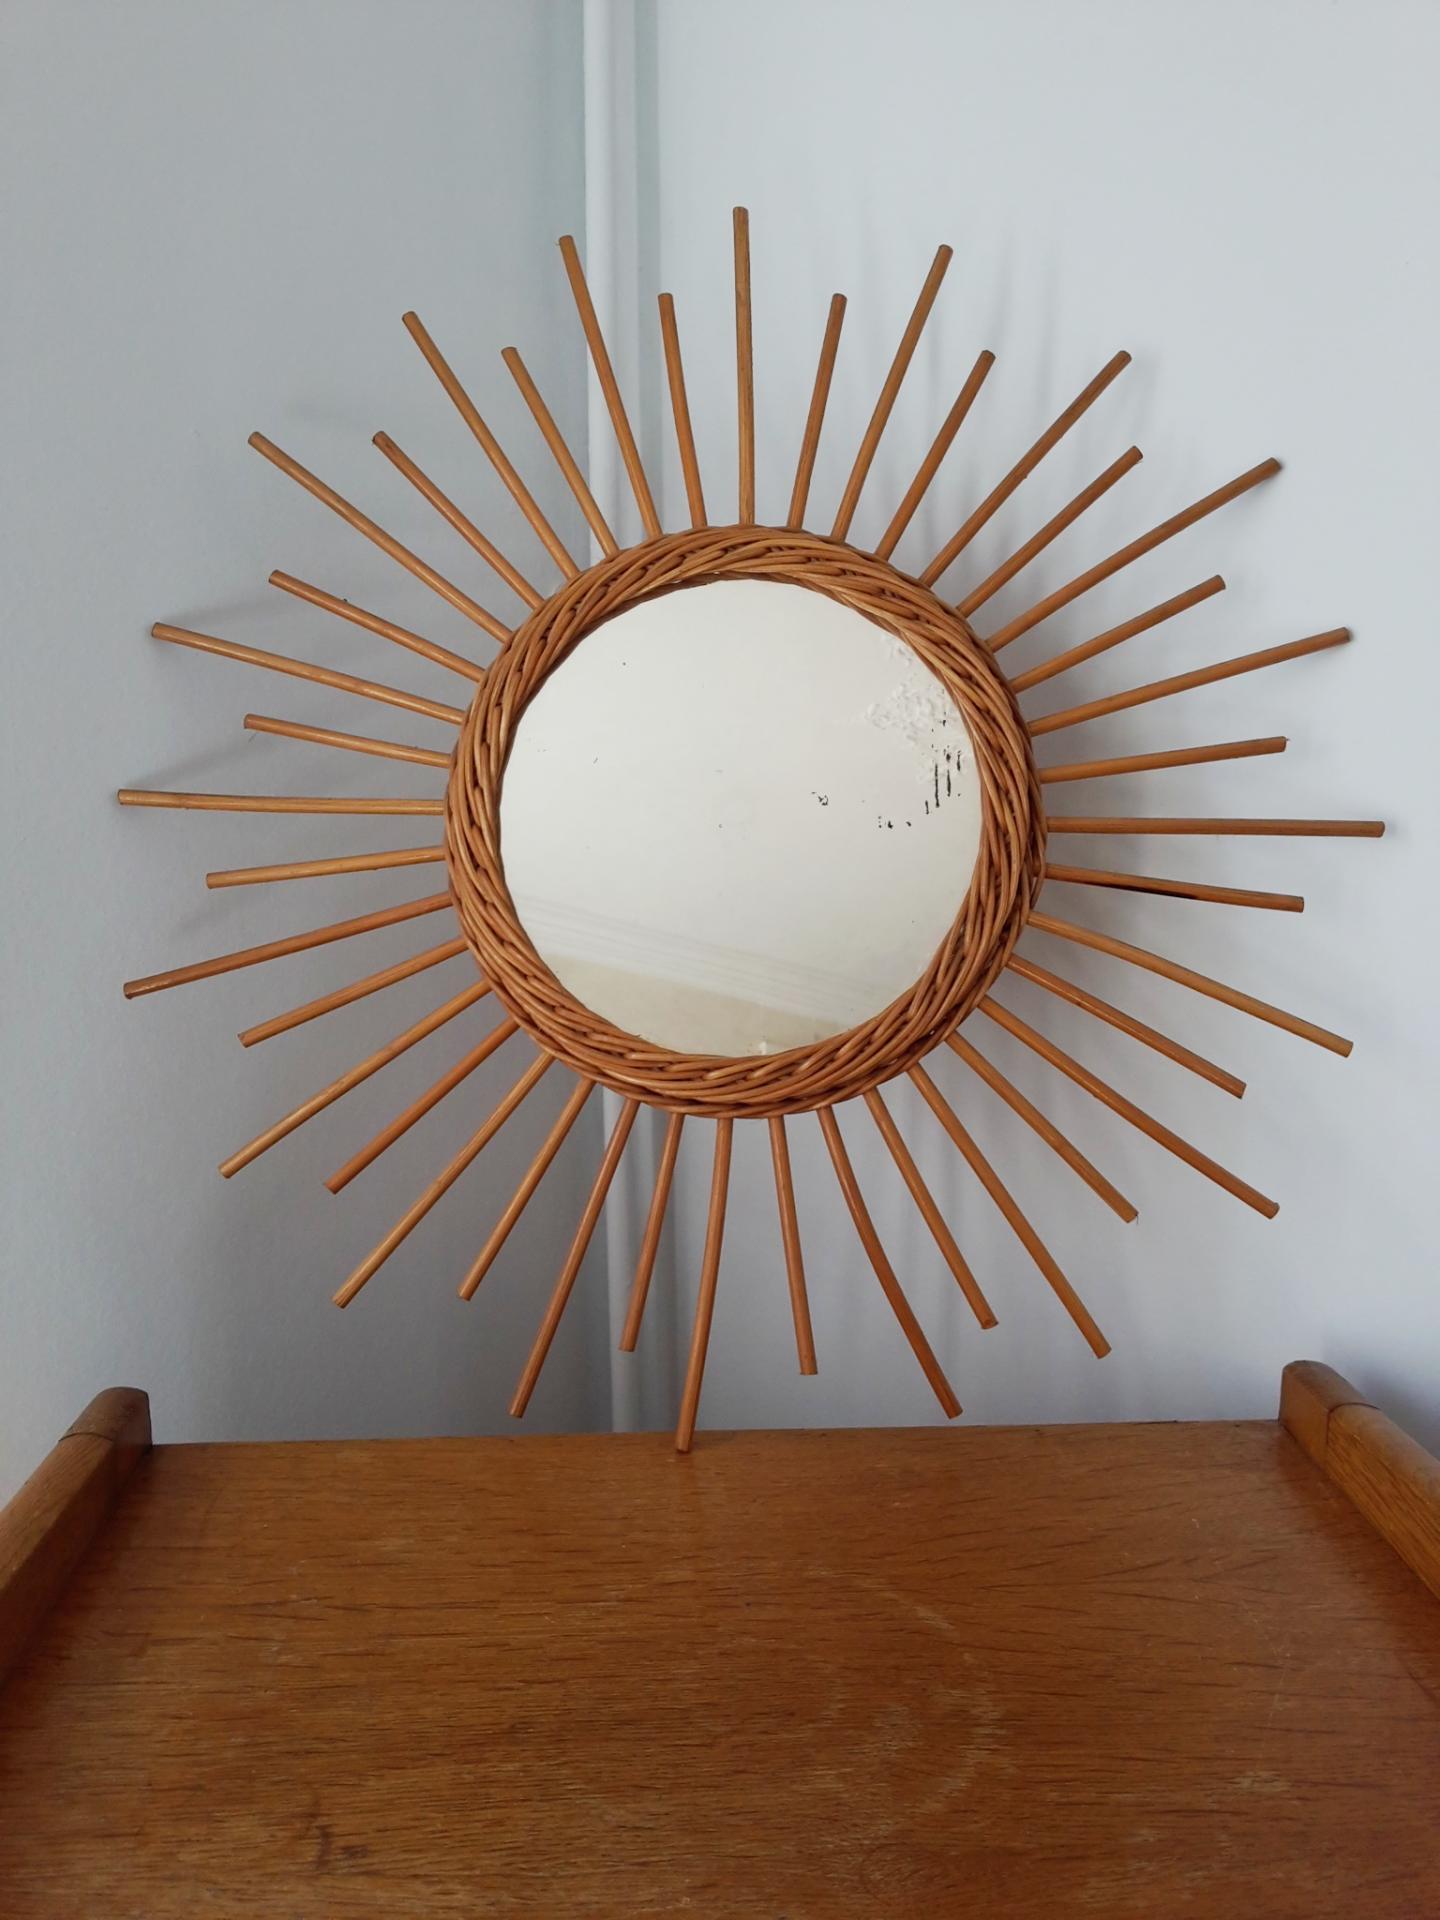 Miroir soleil vintage en osier for Glace soleil miroir